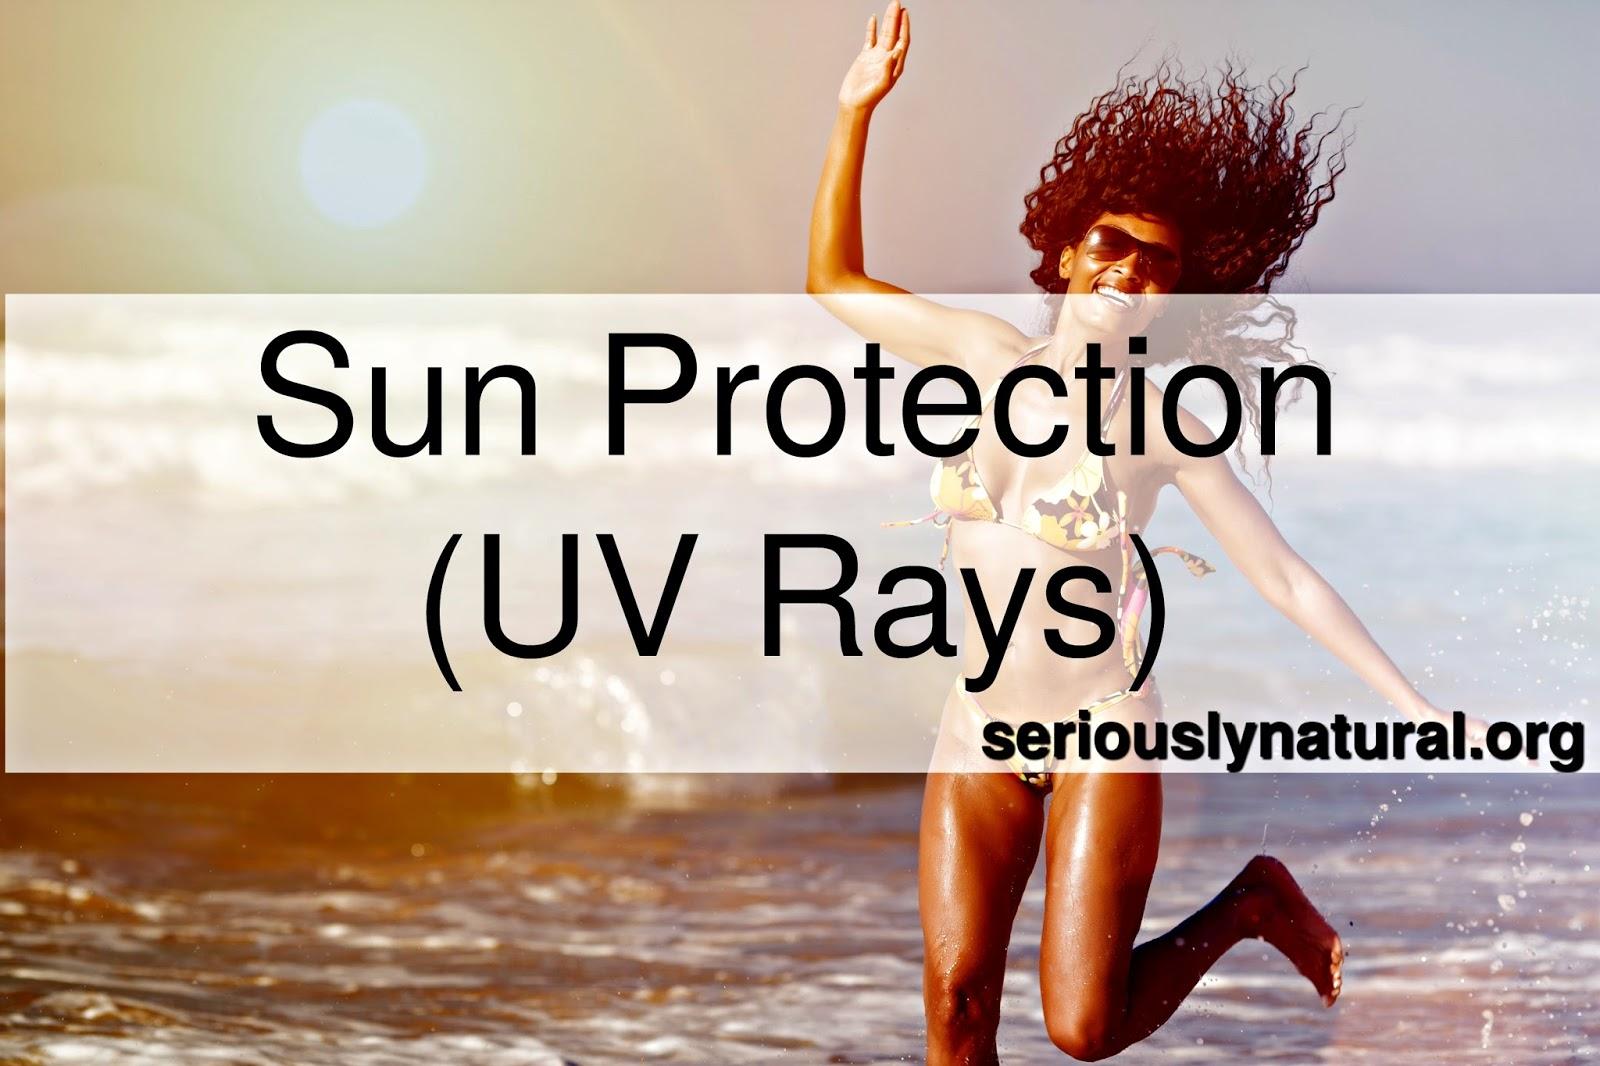 Click here for La Tourangelle Organic Coconut Oil to help block UV rays.